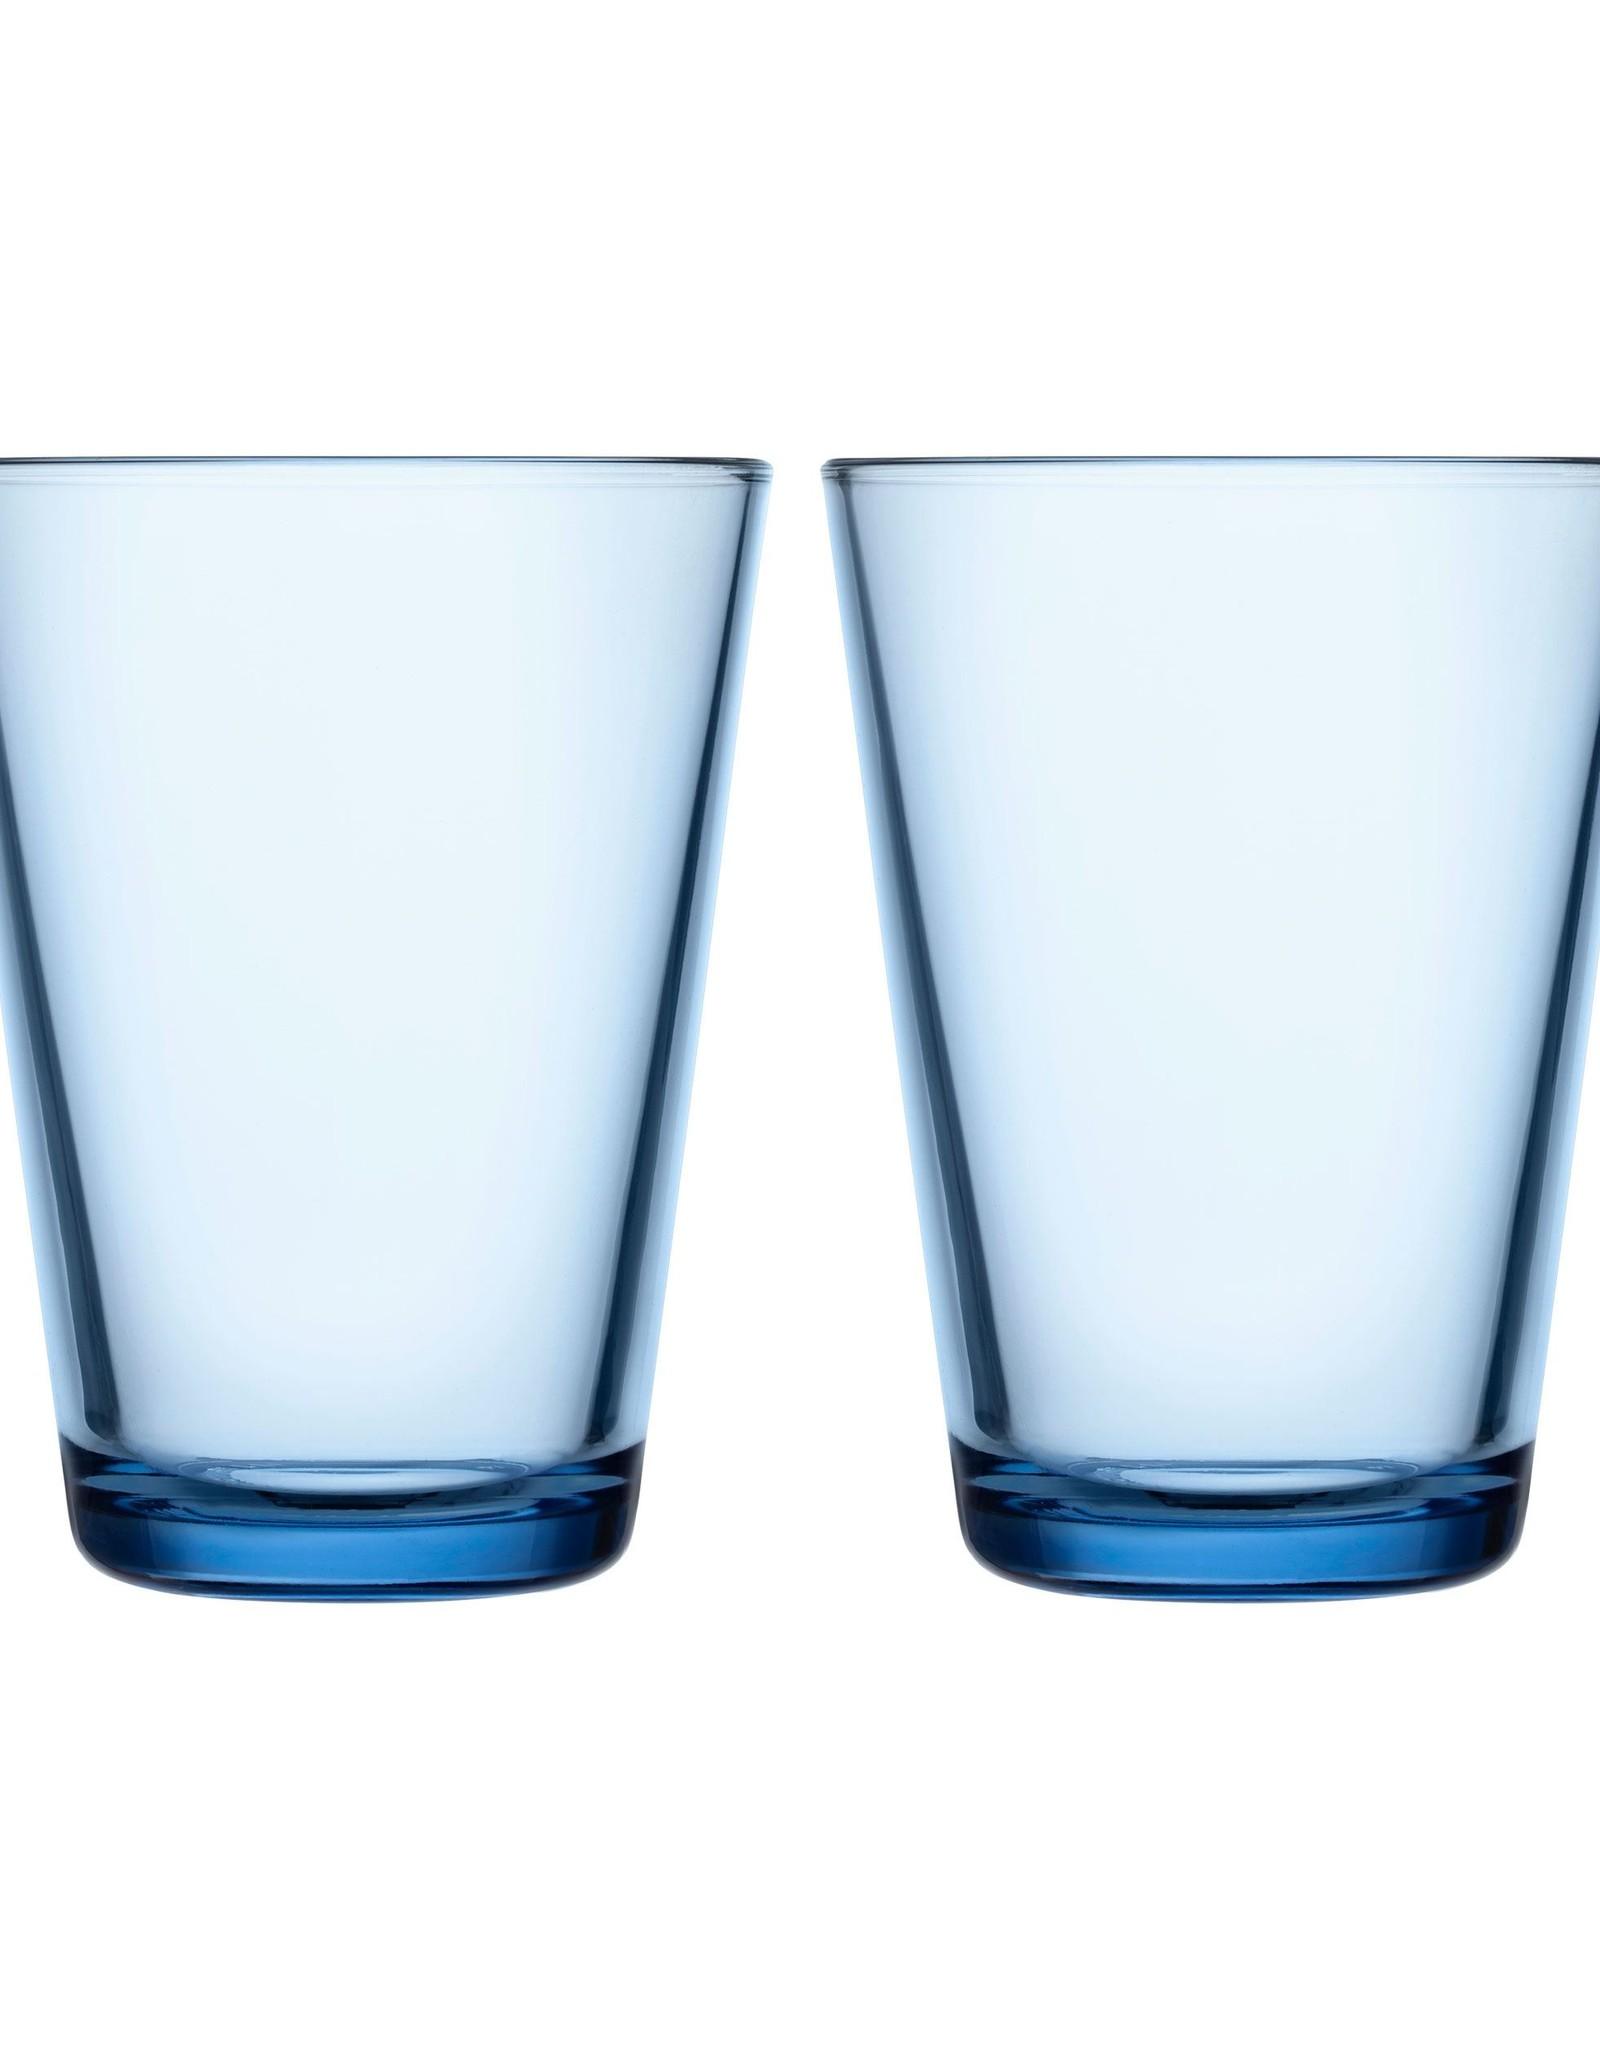 Iittala Iittala Kartio - Glas - 40 cl - Aqua - 2 stuks